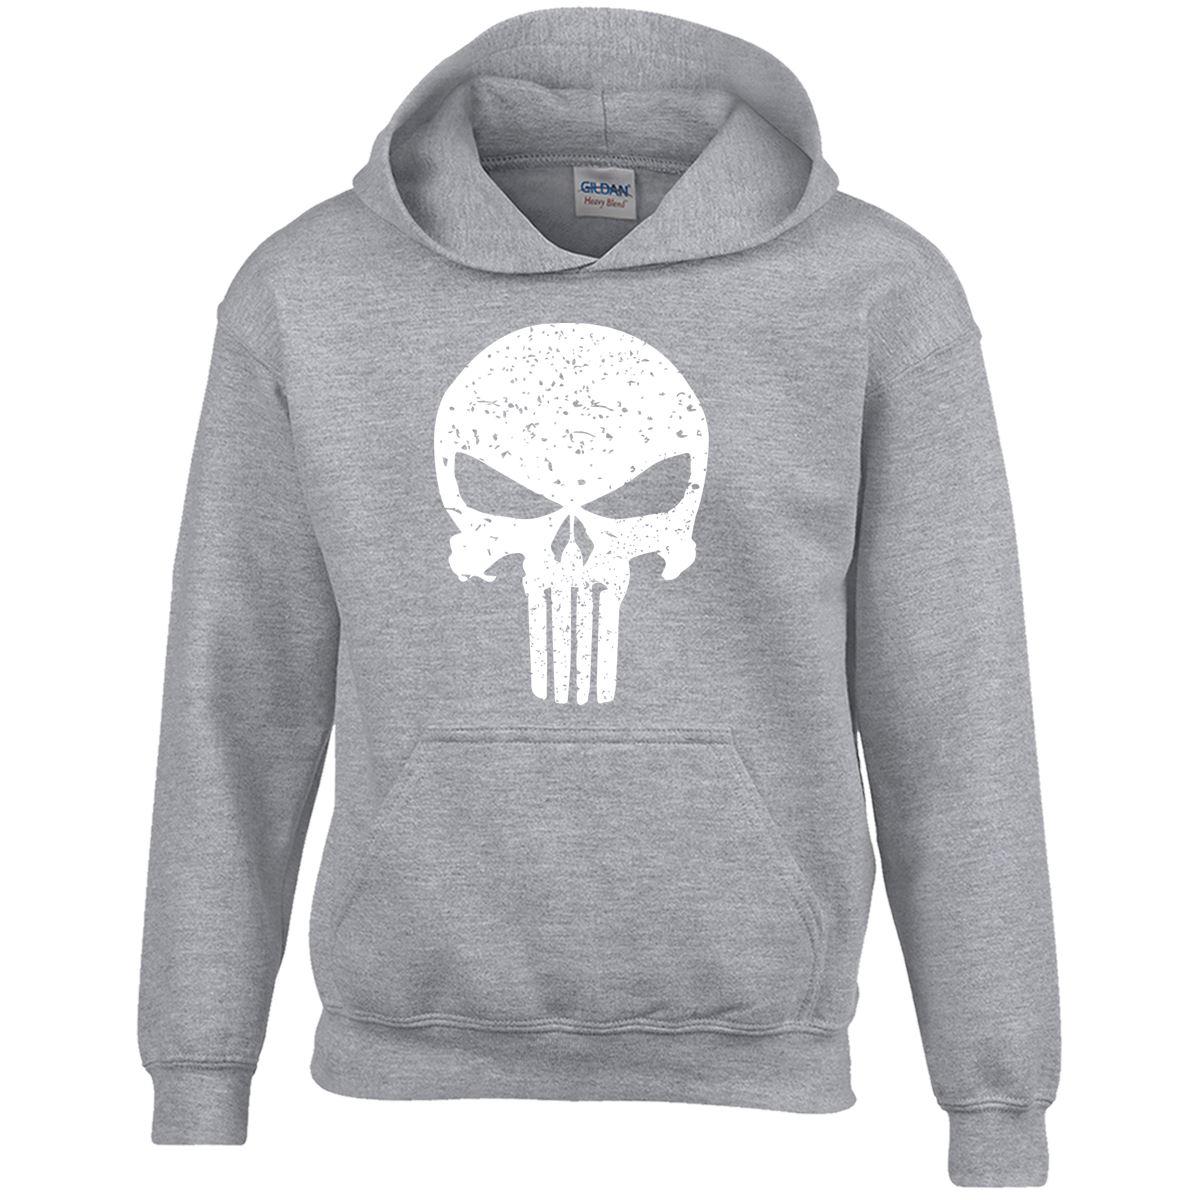 Punshier Punisher Youth Mens Top GIFT Hooded Dress Marvel Comics Bodybuilding